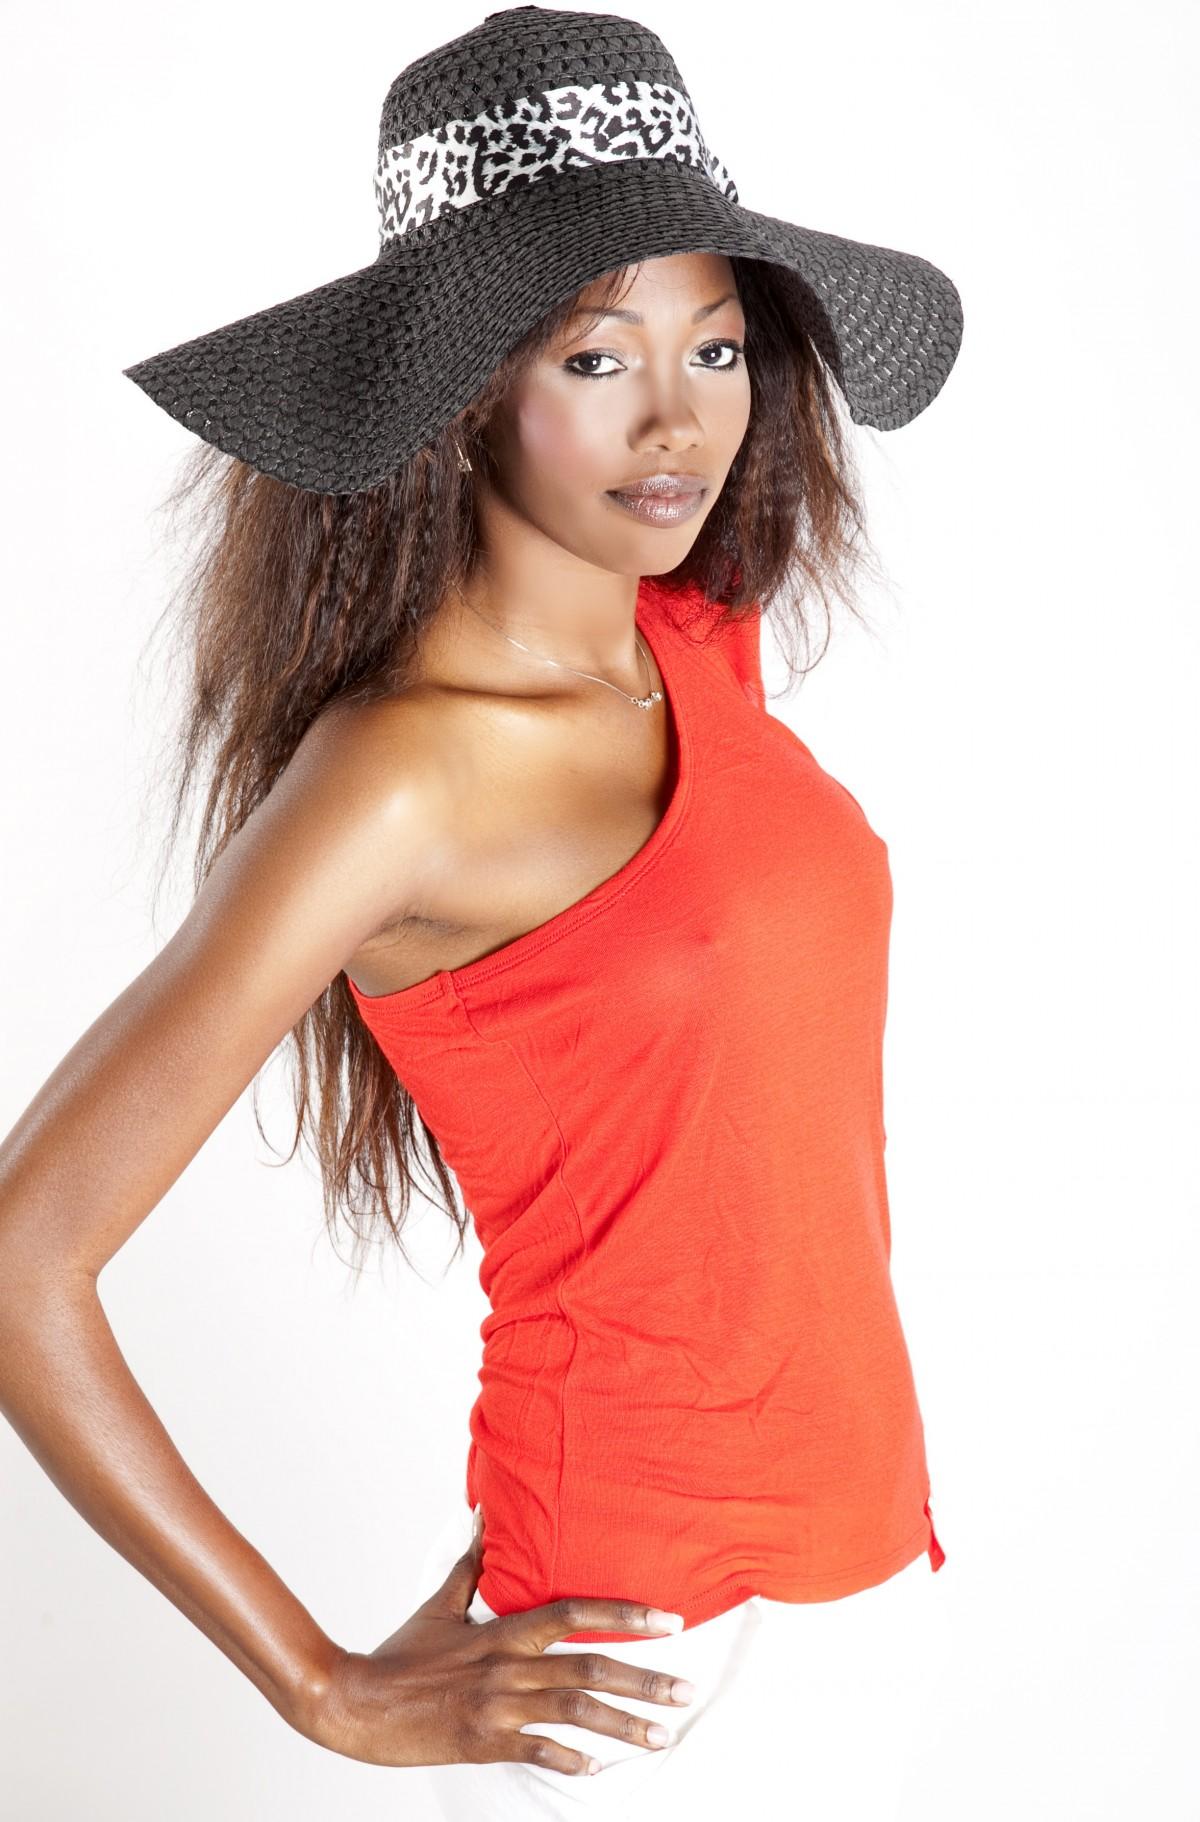 gadis wanita rambut potret topi pakaian